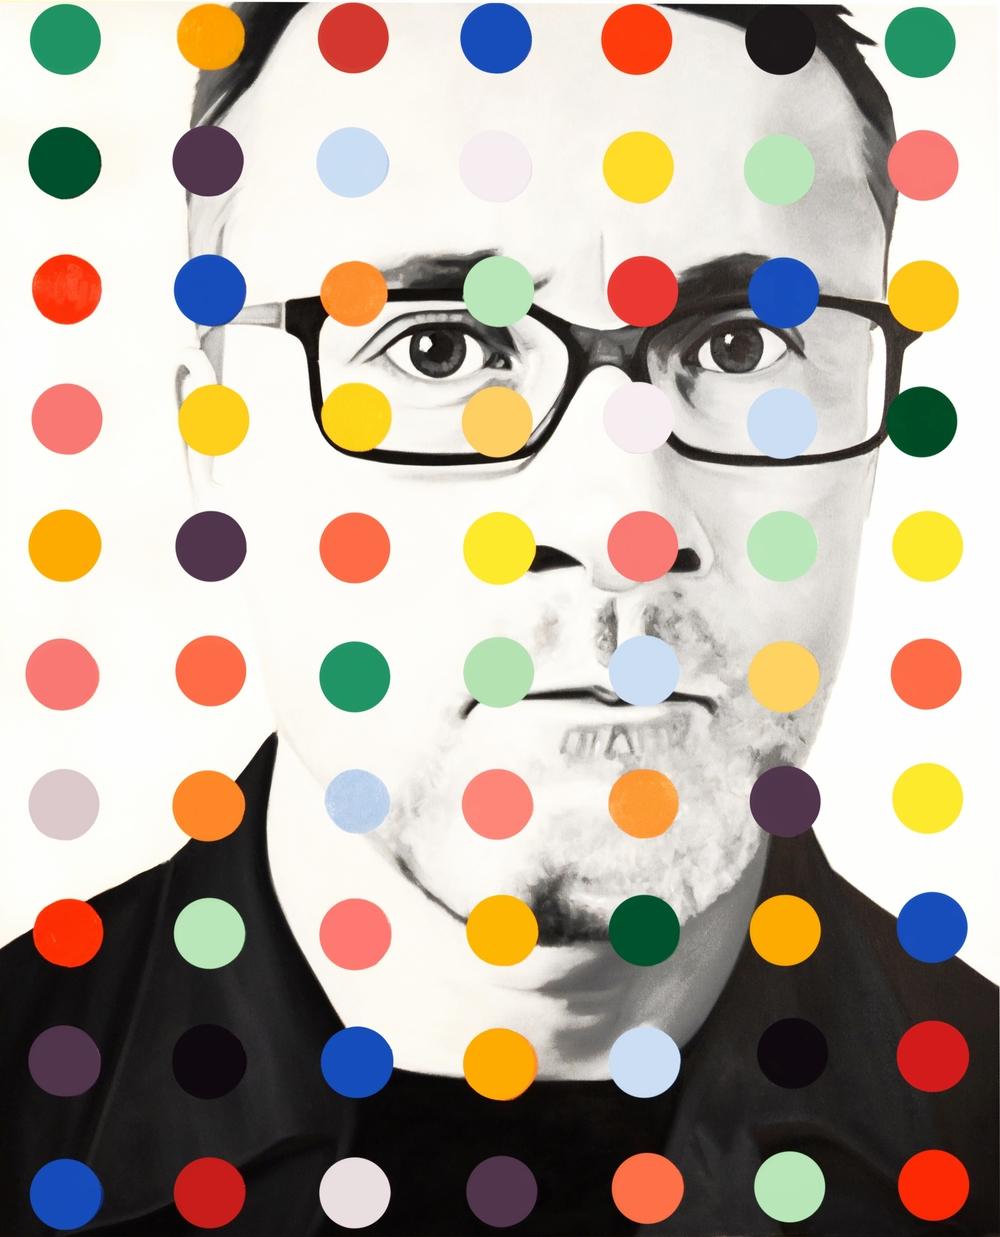 Damien Dot  Oil on Canvas - 54 x 44in - 2013